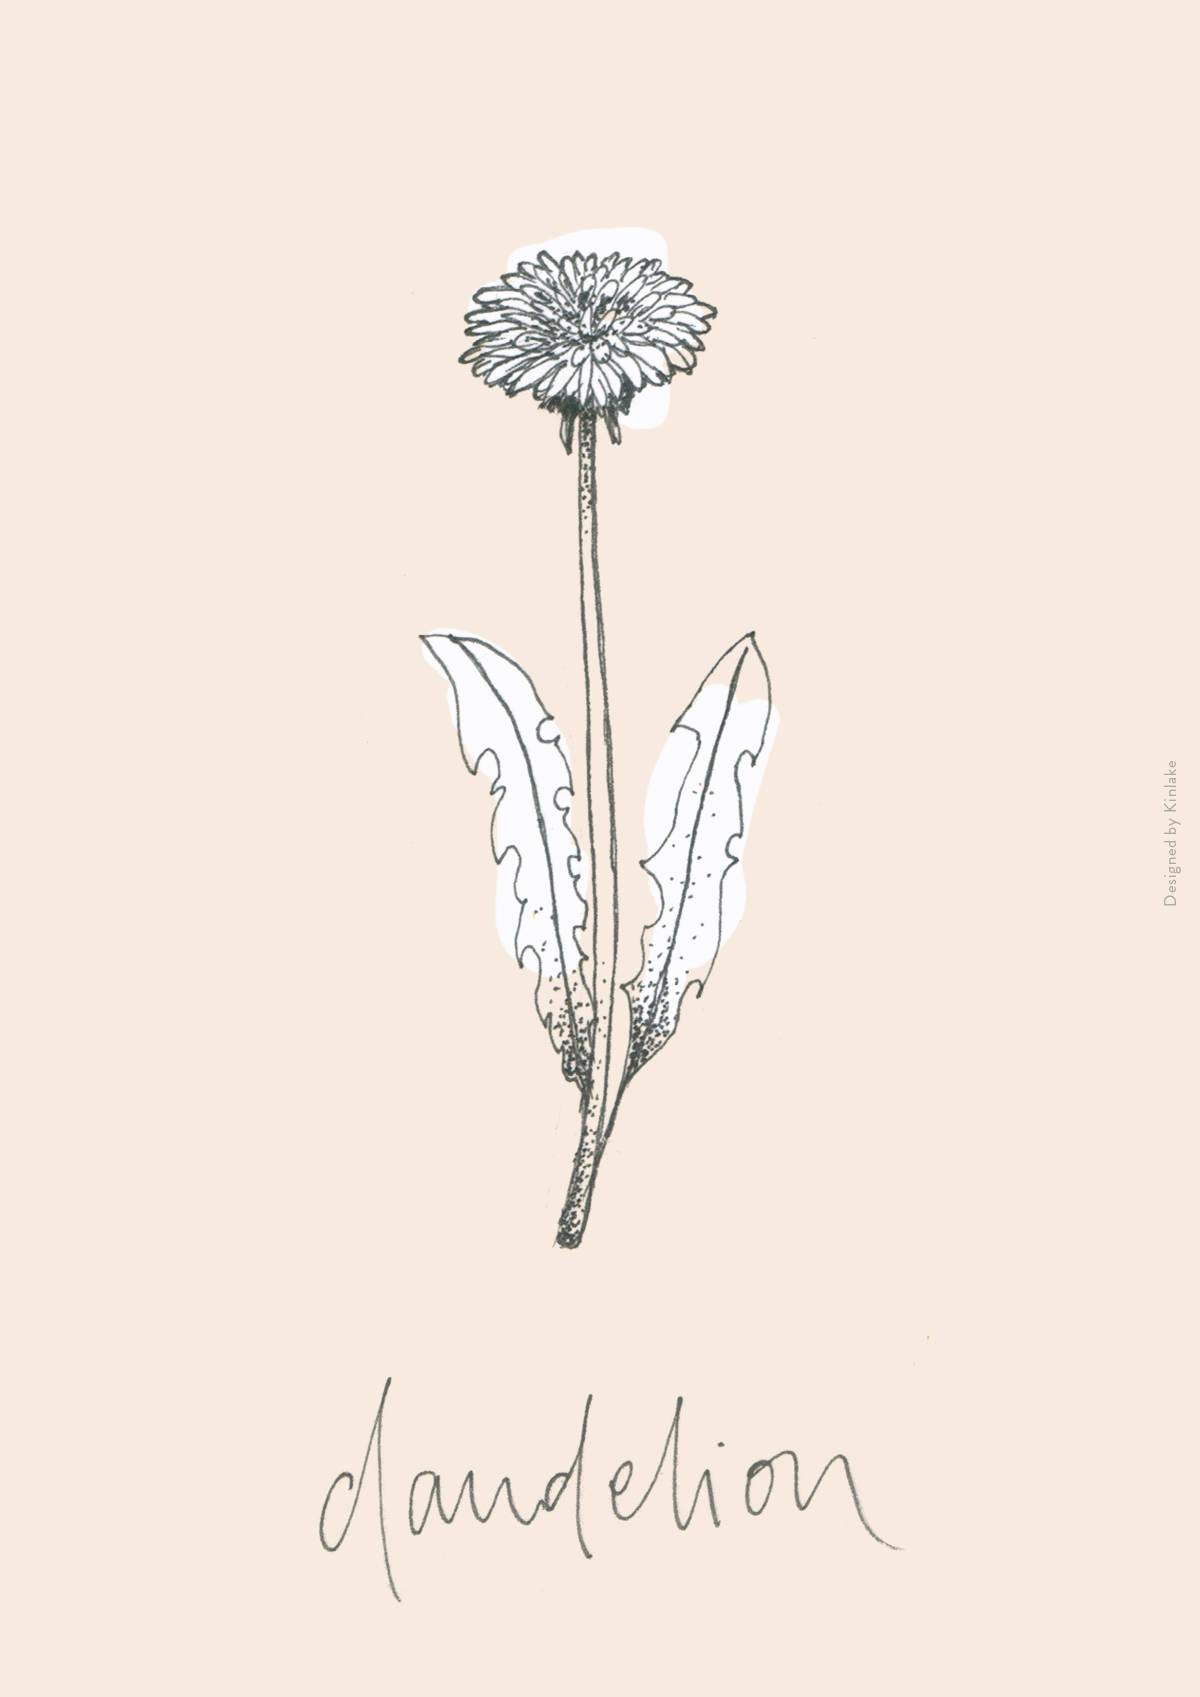 A4-Edible-Weeds-Kinlake-dandelion